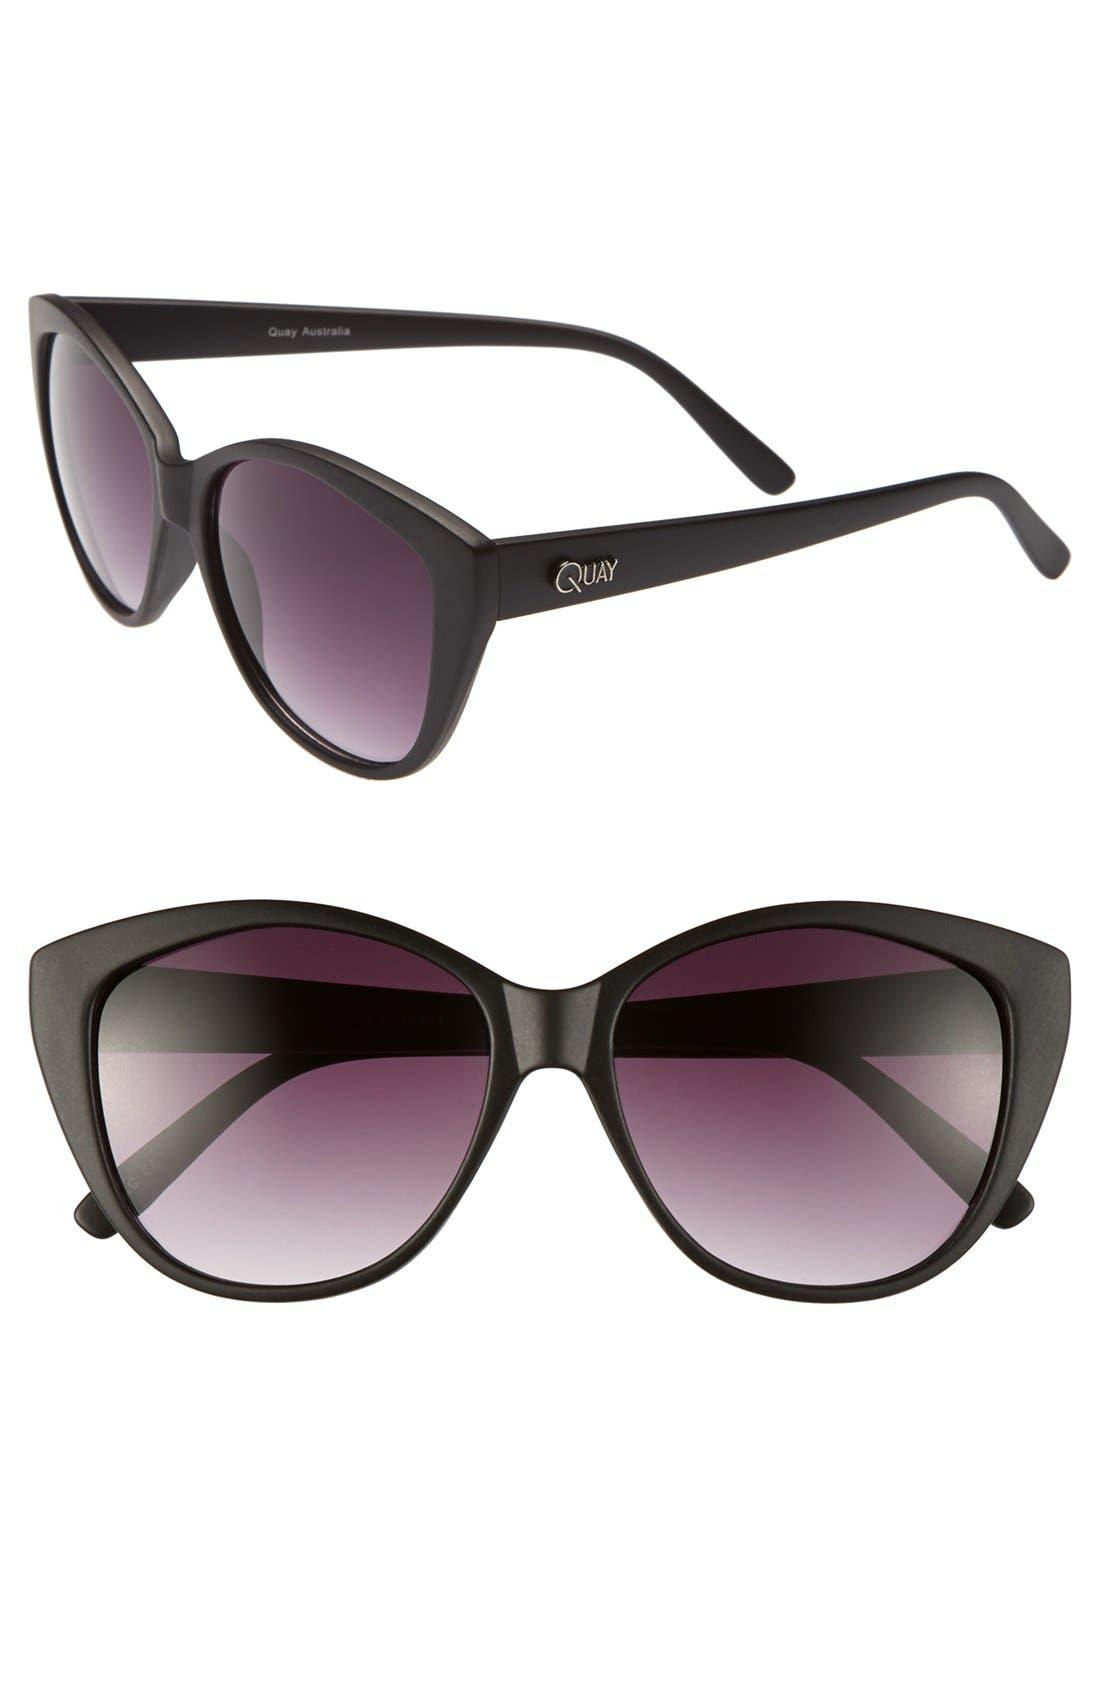 Main Image - Quay Cat's Eye Sunglasses